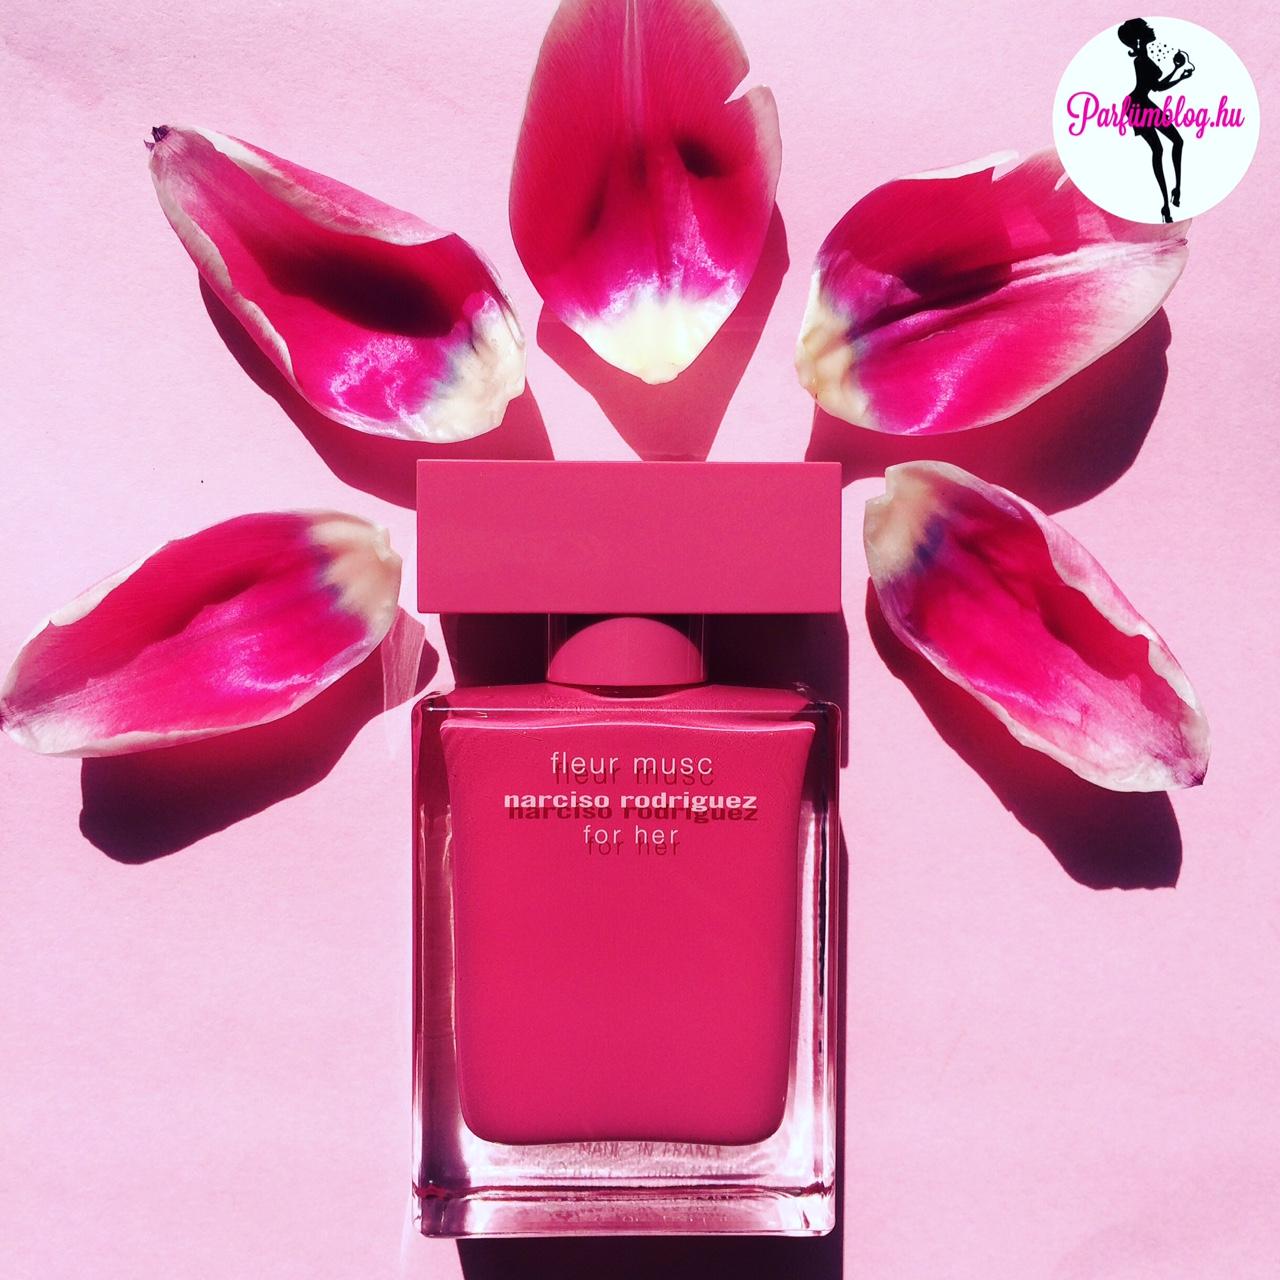 Narciso Rodrigues Fleur Musc For Her – újdonság és parfümkritika